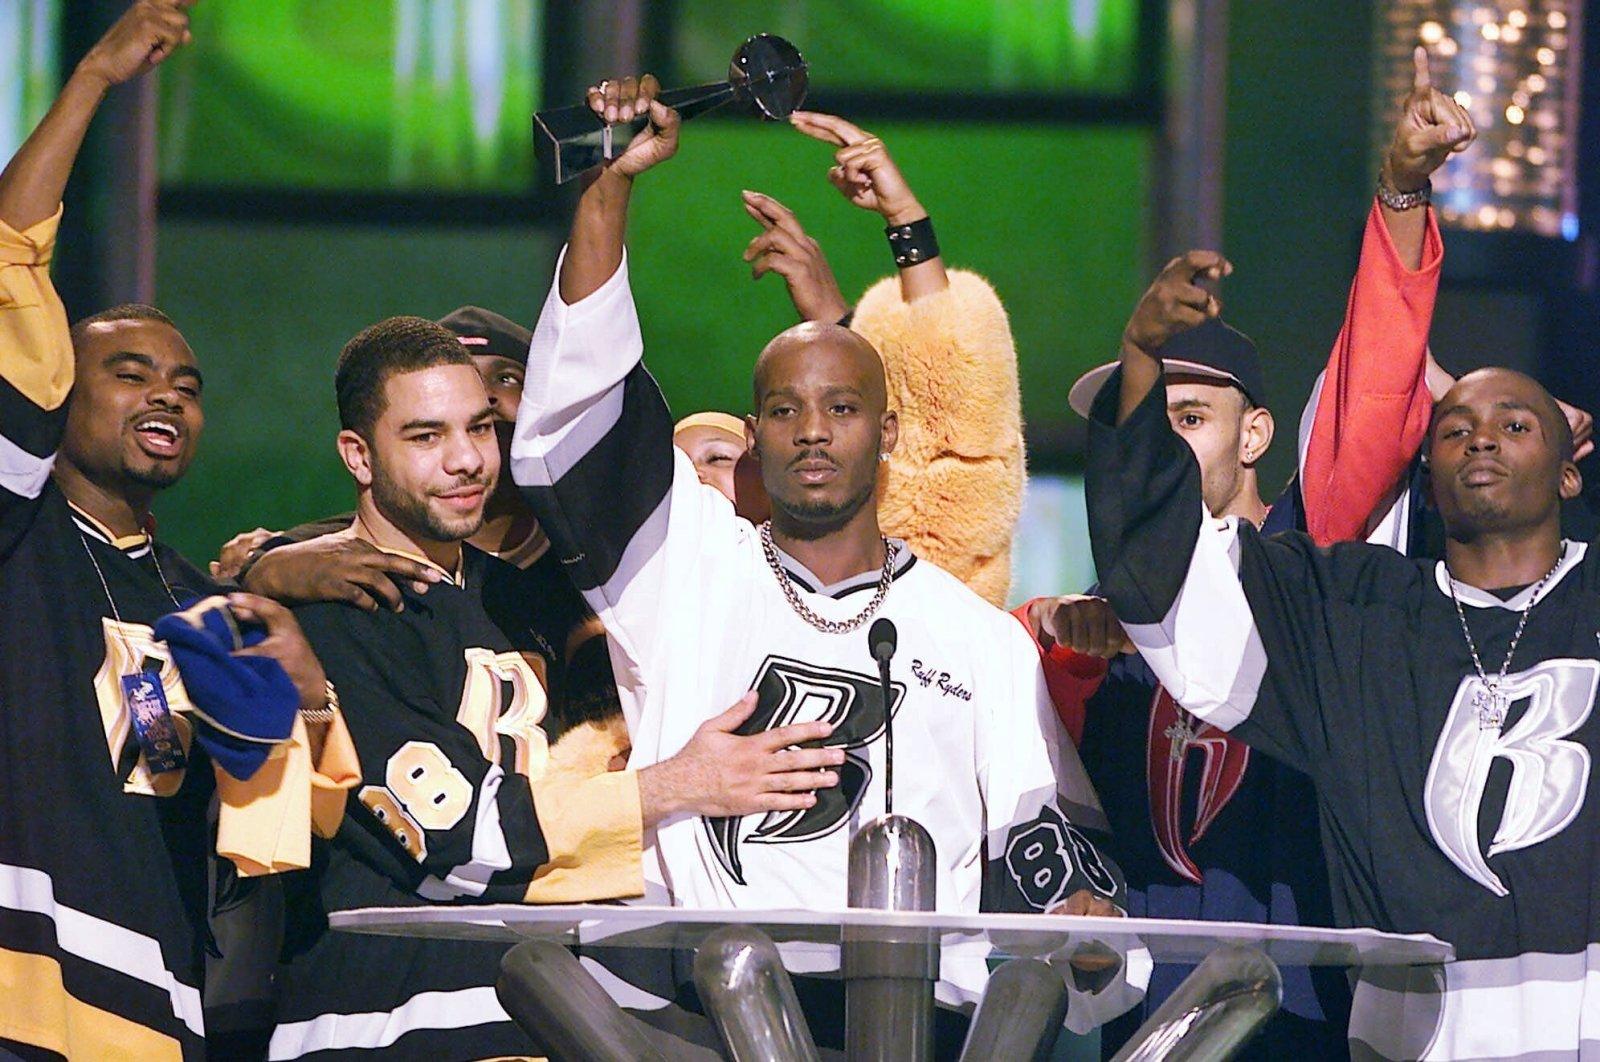 DMX (C) accepts the R&B Album Artist of the Year during the 1999 Billboard Music Awards in Las Vegas, U.S., Dec. 8, 1999. (AP Photo)